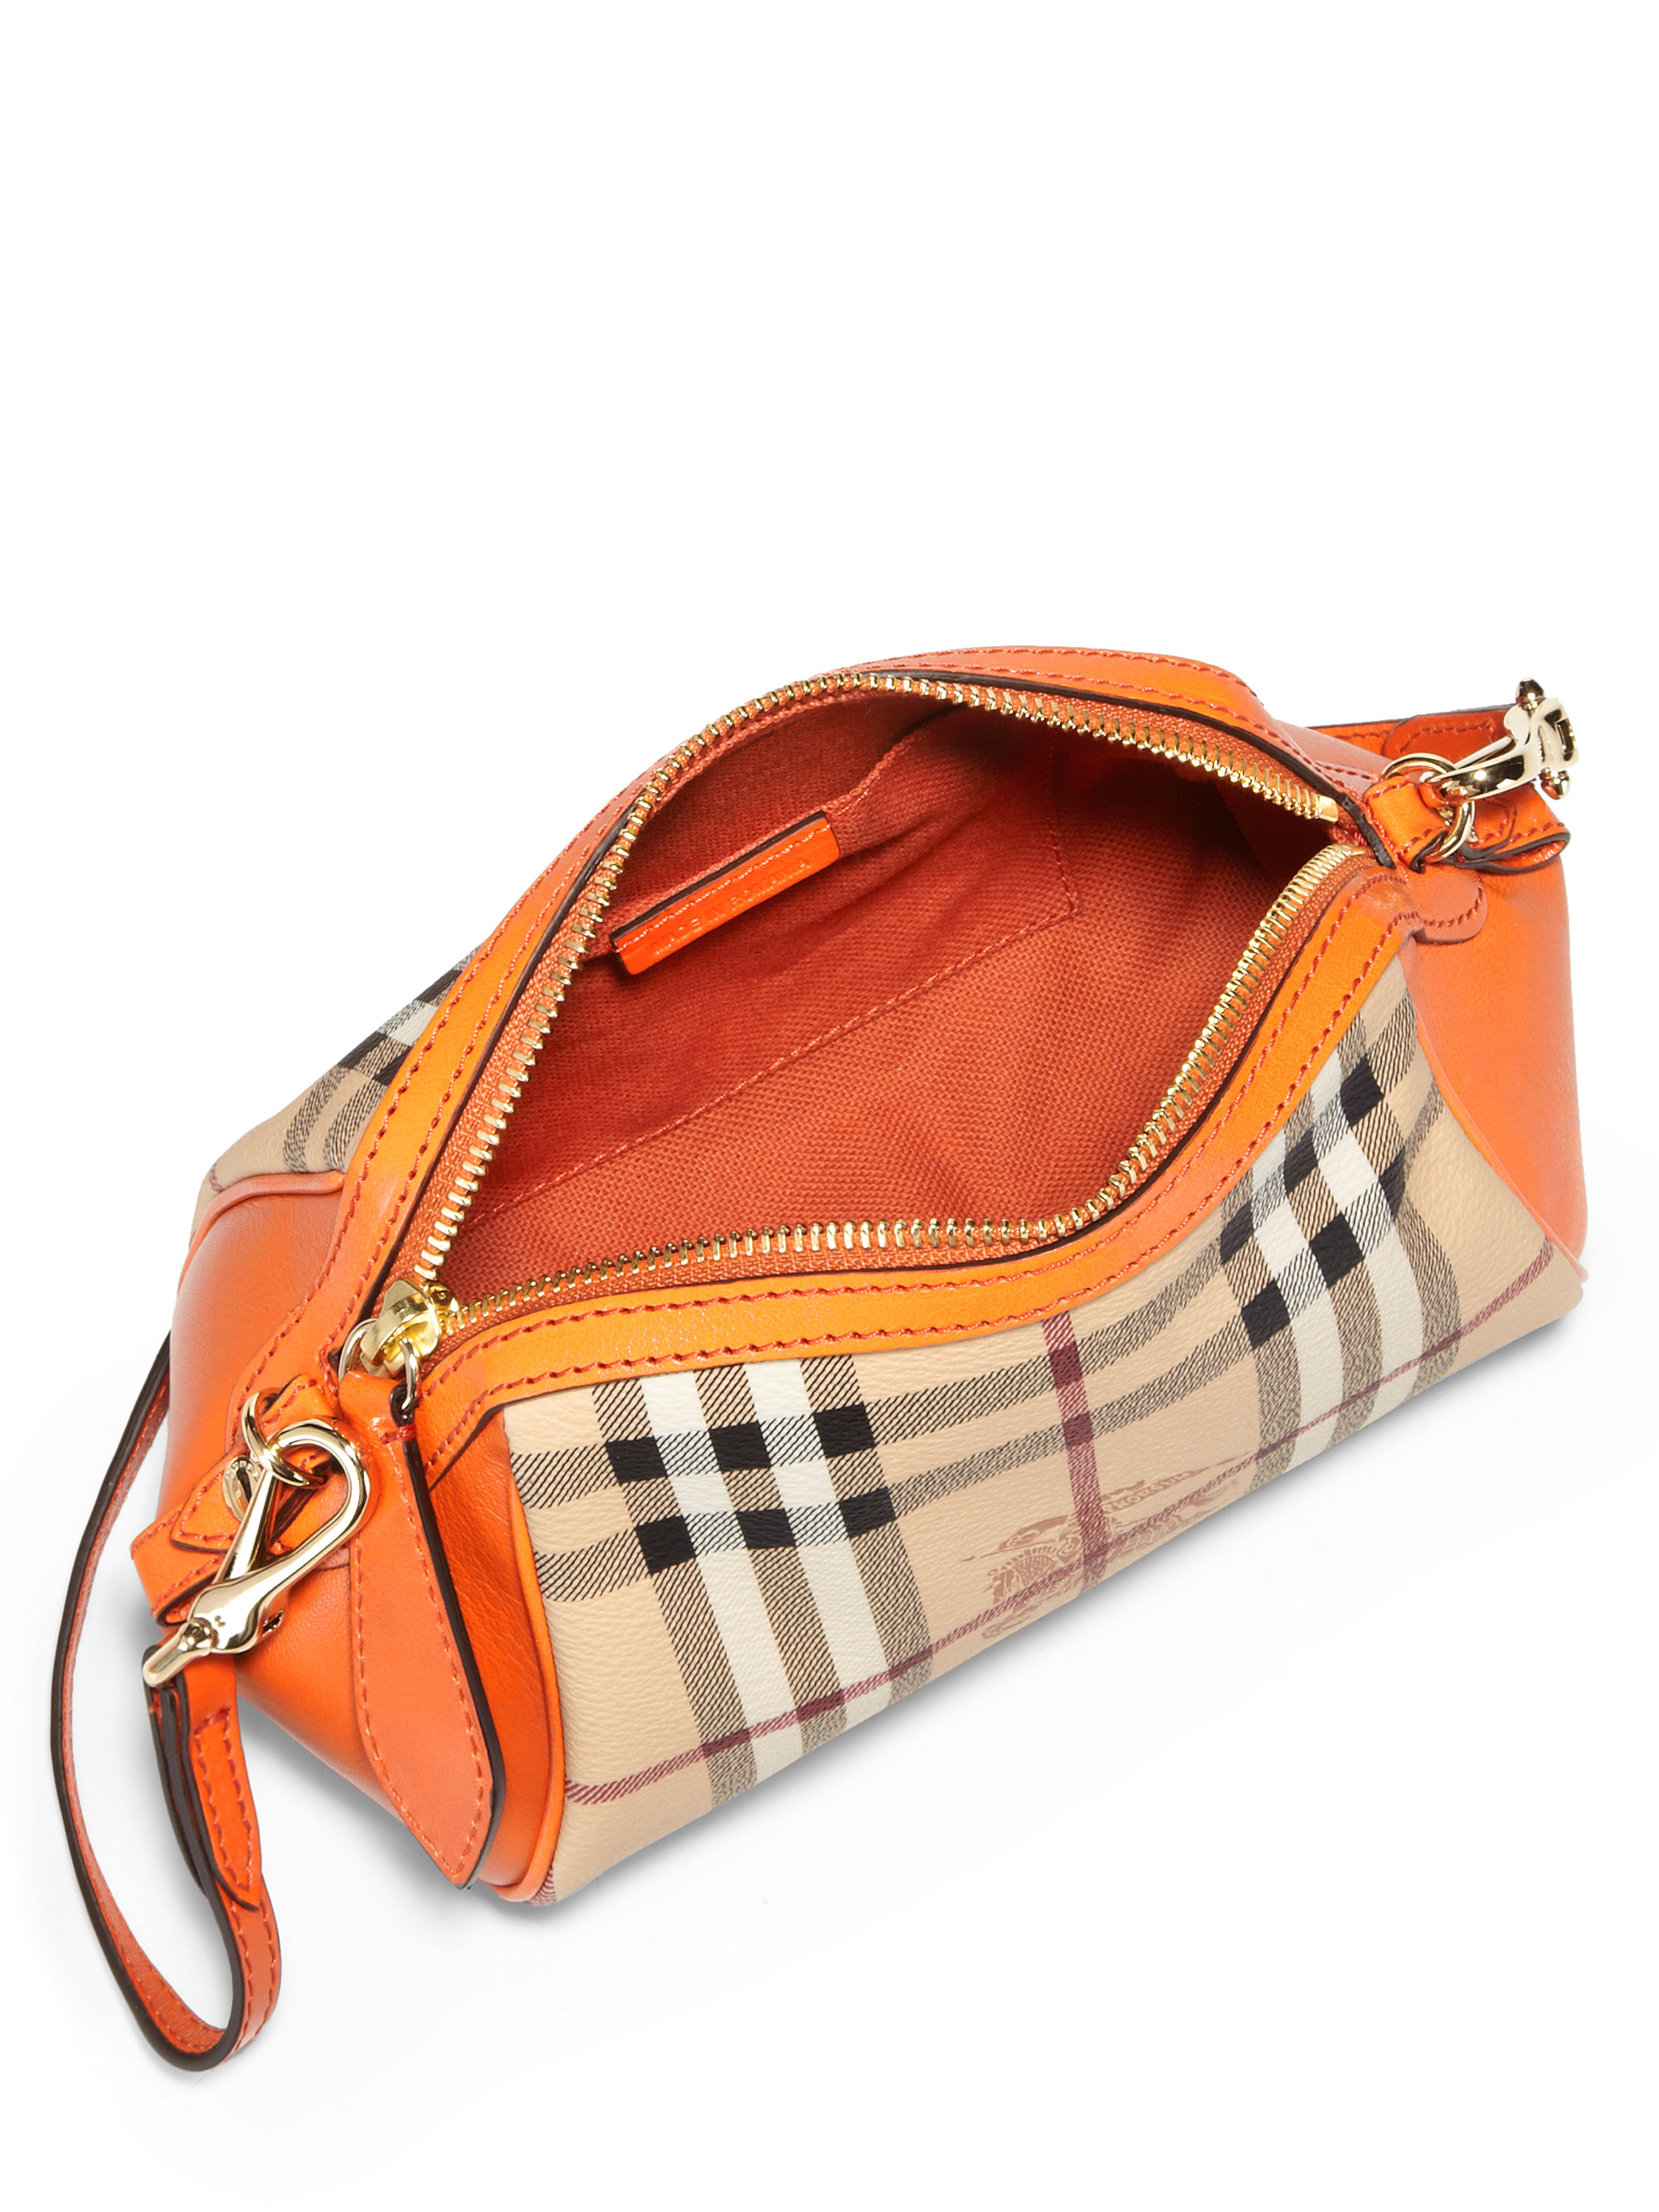 Burberry Crossbody Bag Orange